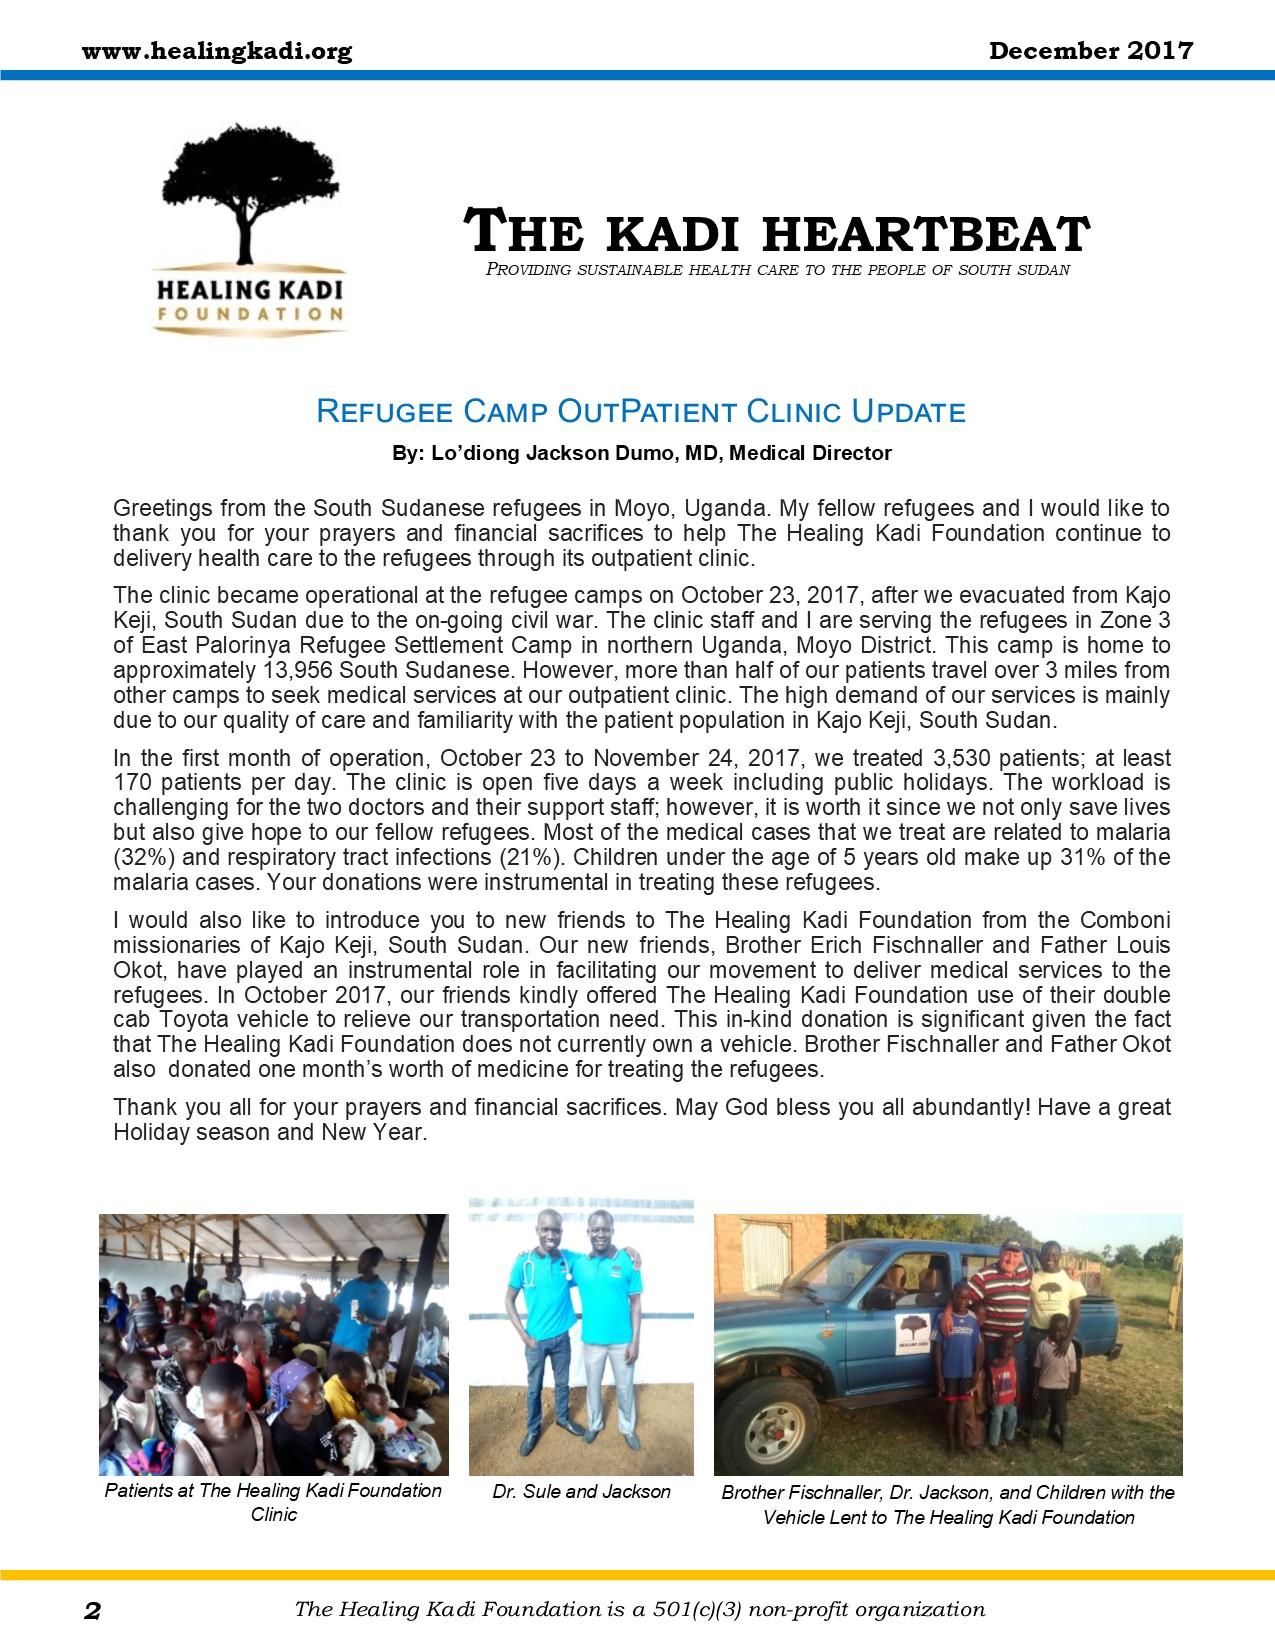 The Kadi Beat_December_9_2017-p2.jpg